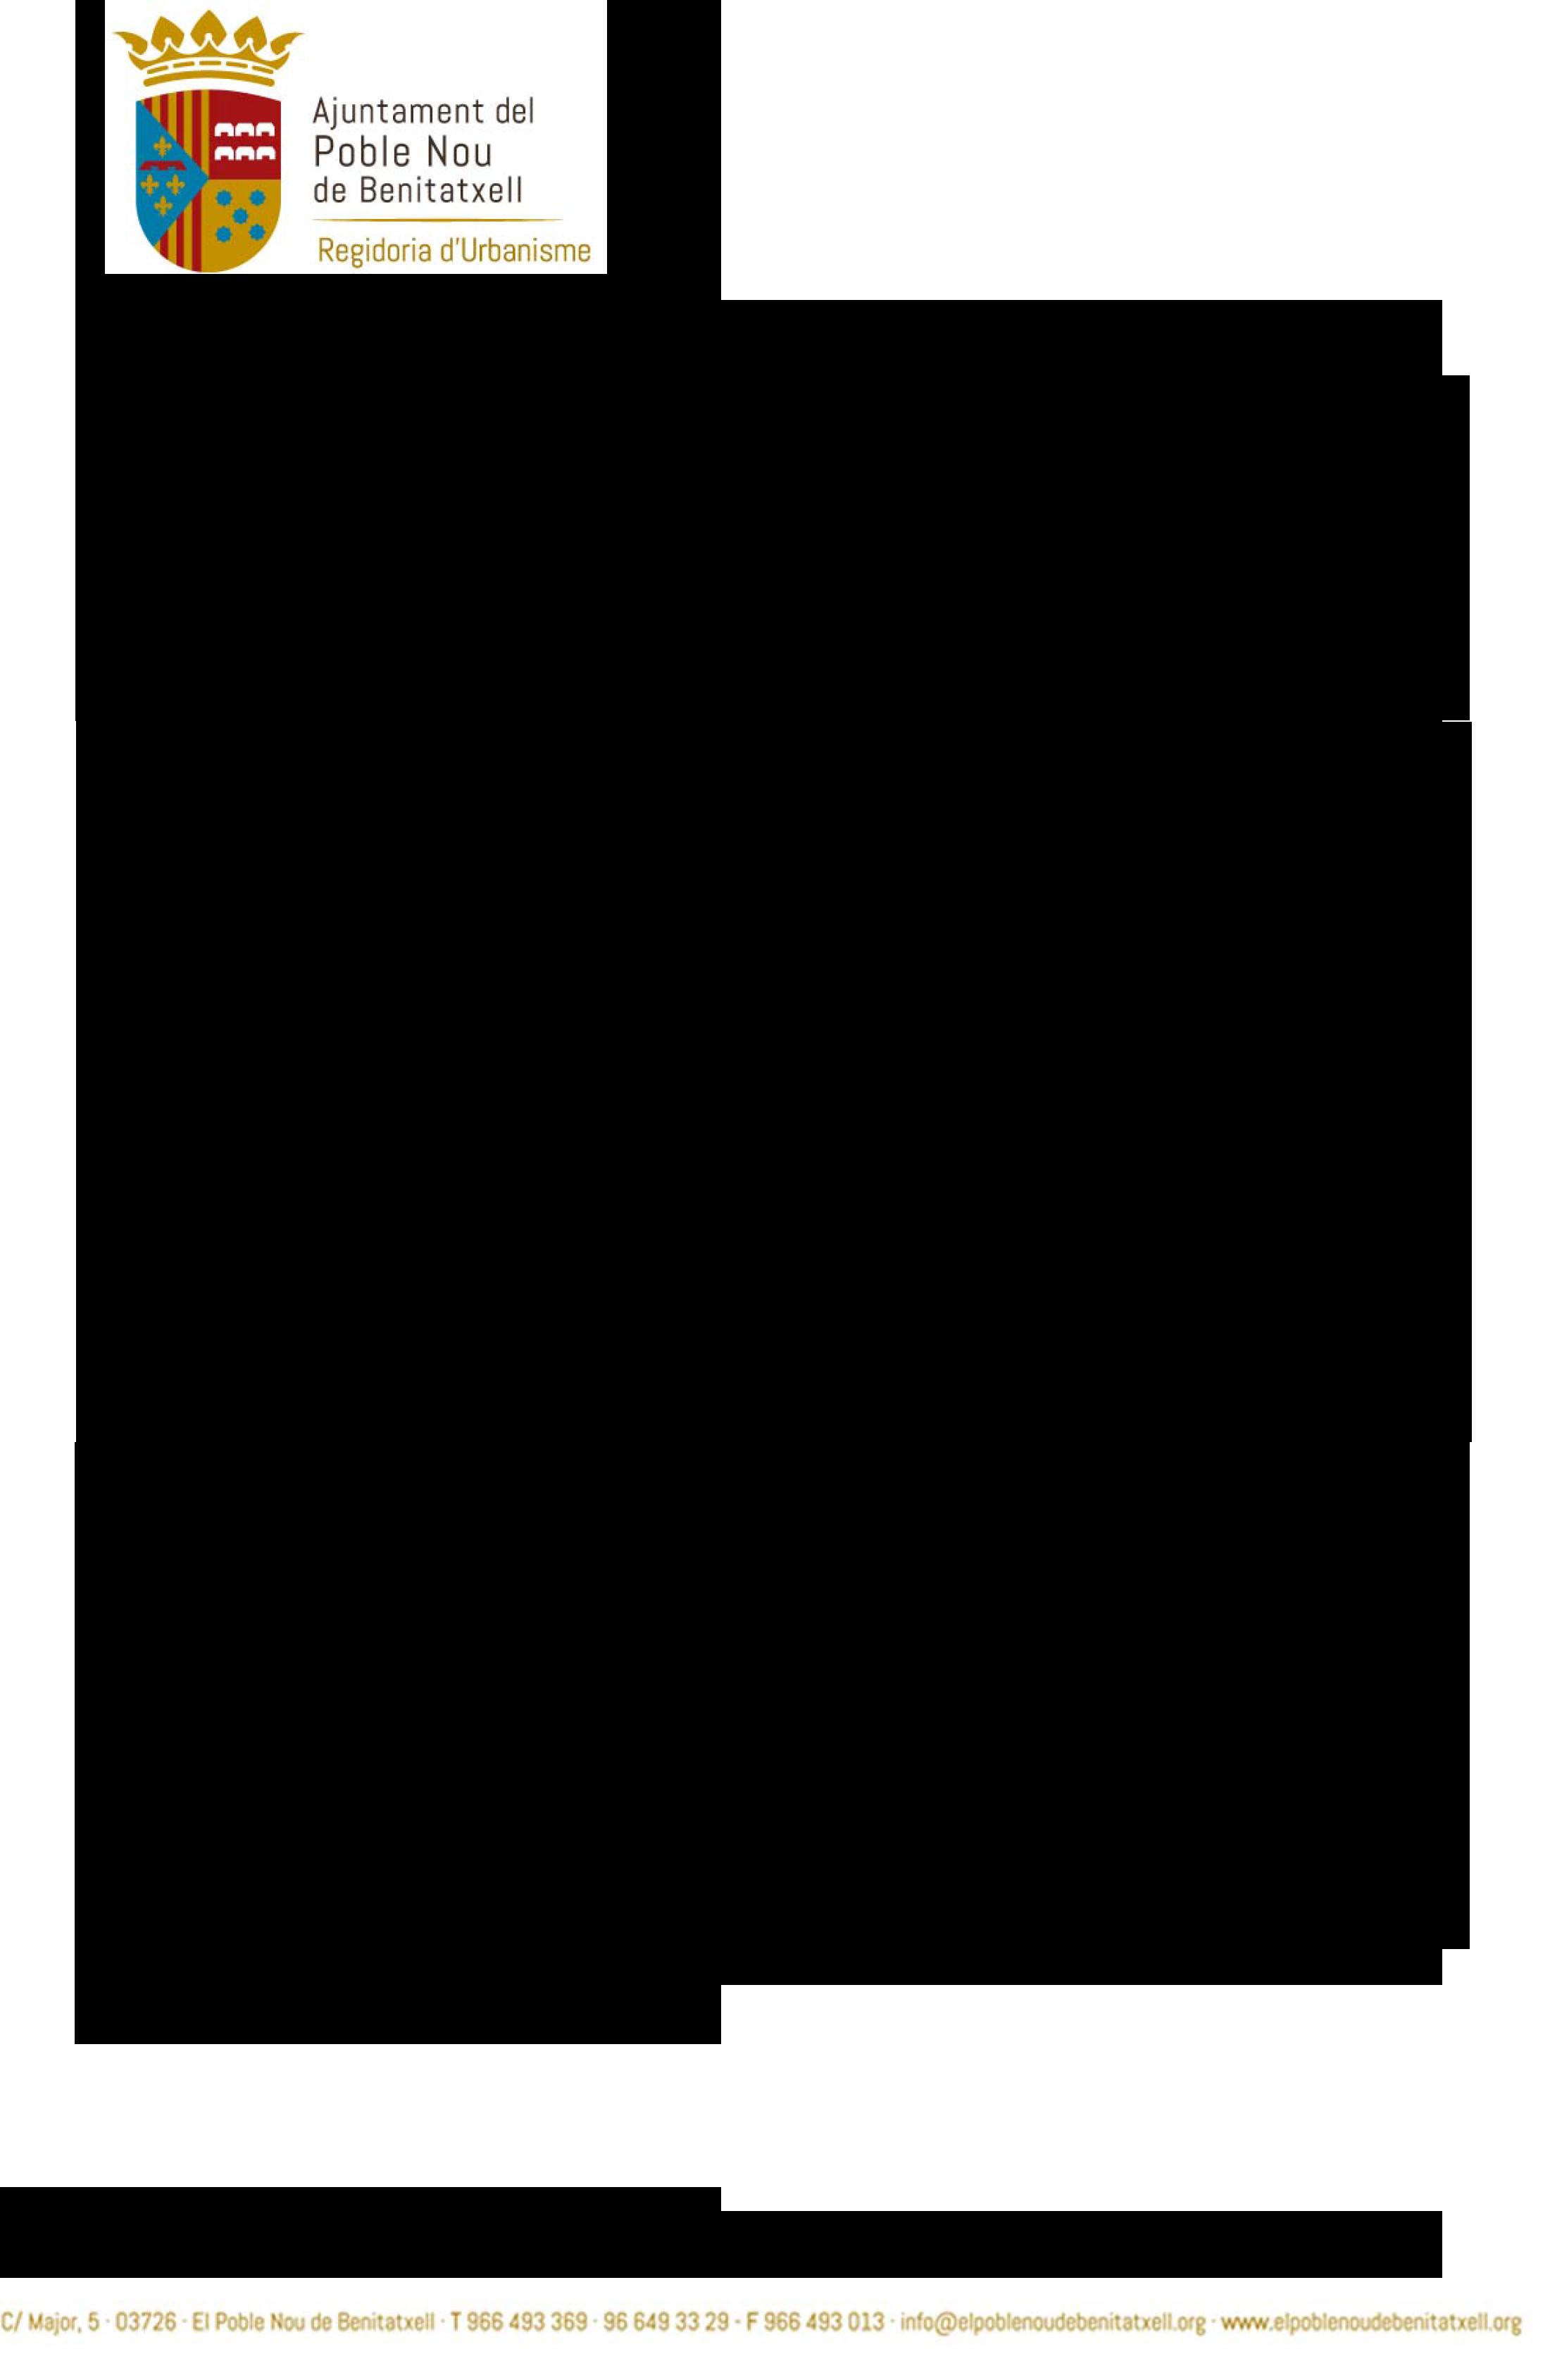 DECLARACION-RESPONSABLE-SEGUNDA-OCUPACION-BENITATXELL-3